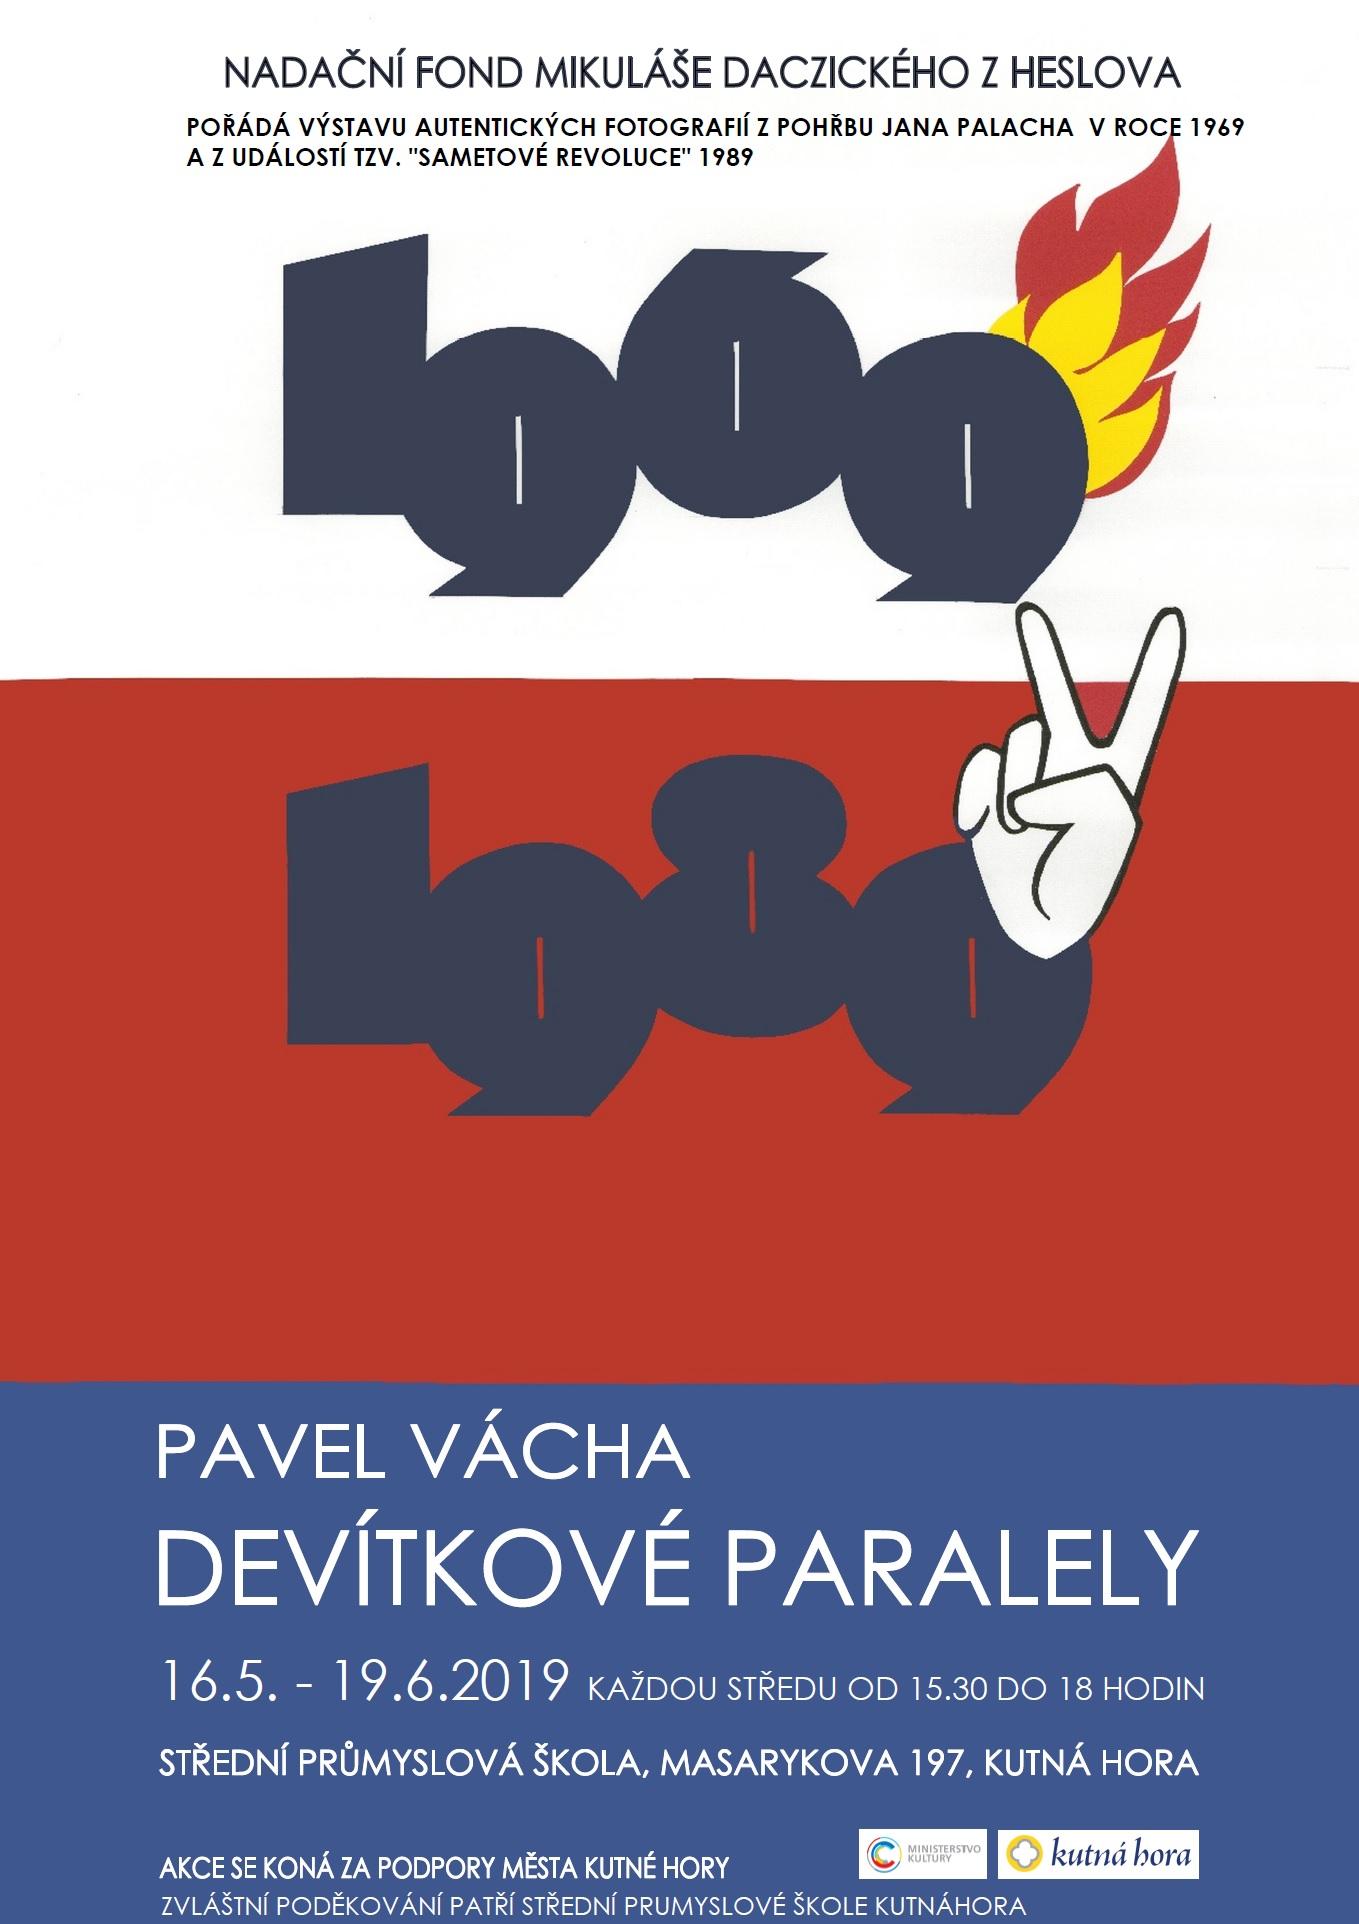 5692-devitkove-paralely.jpg